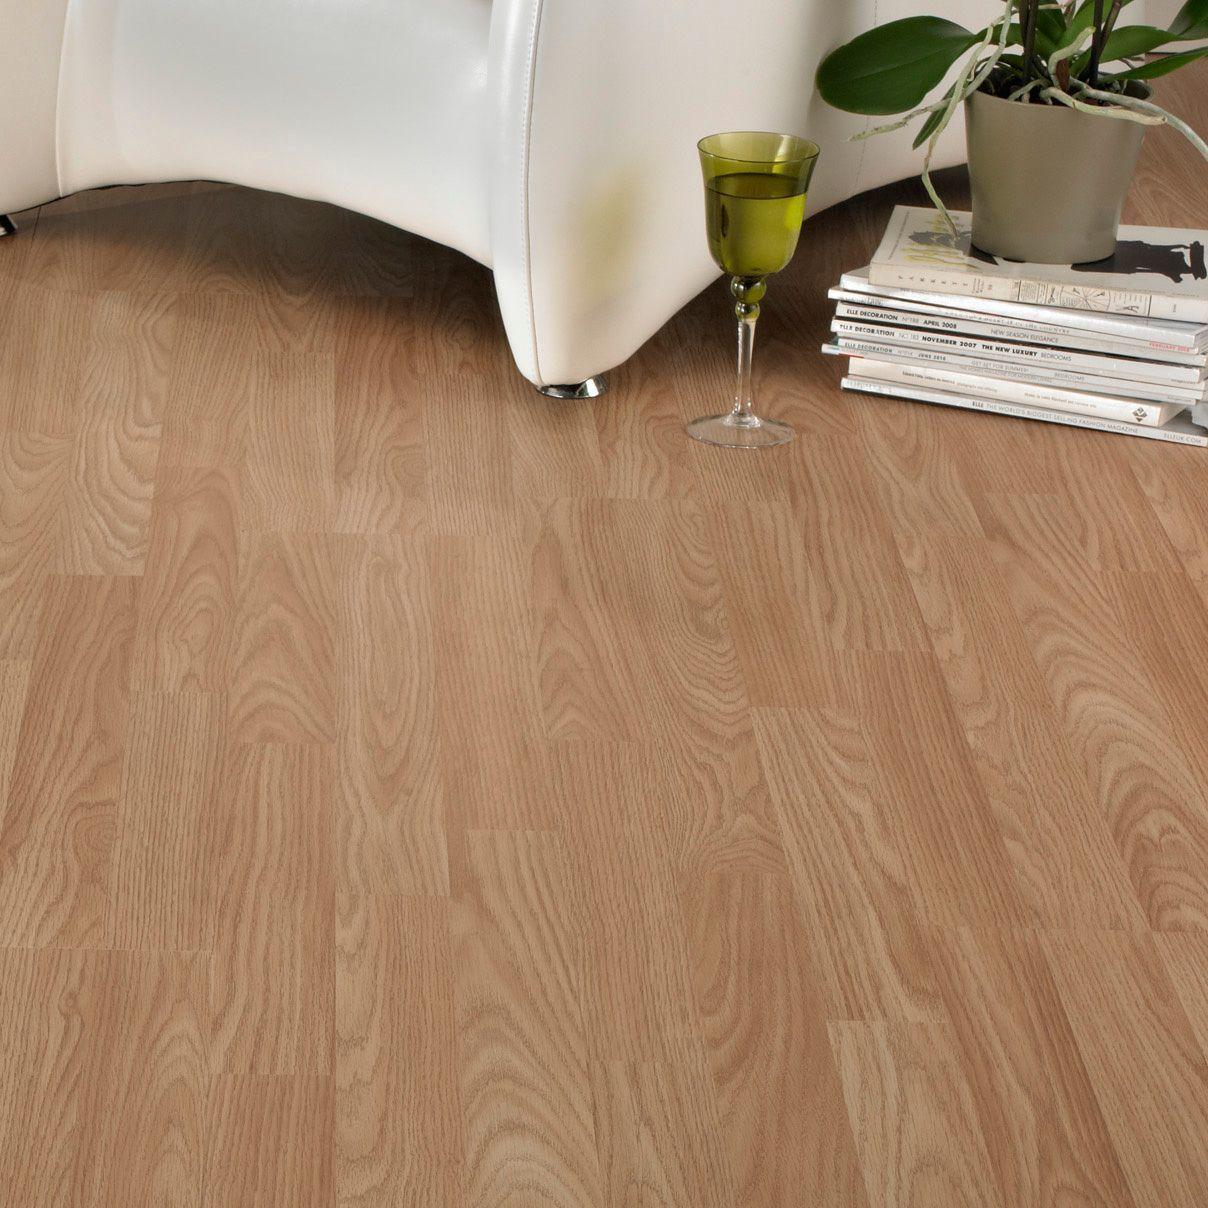 Wood Effect Laminate Flooring